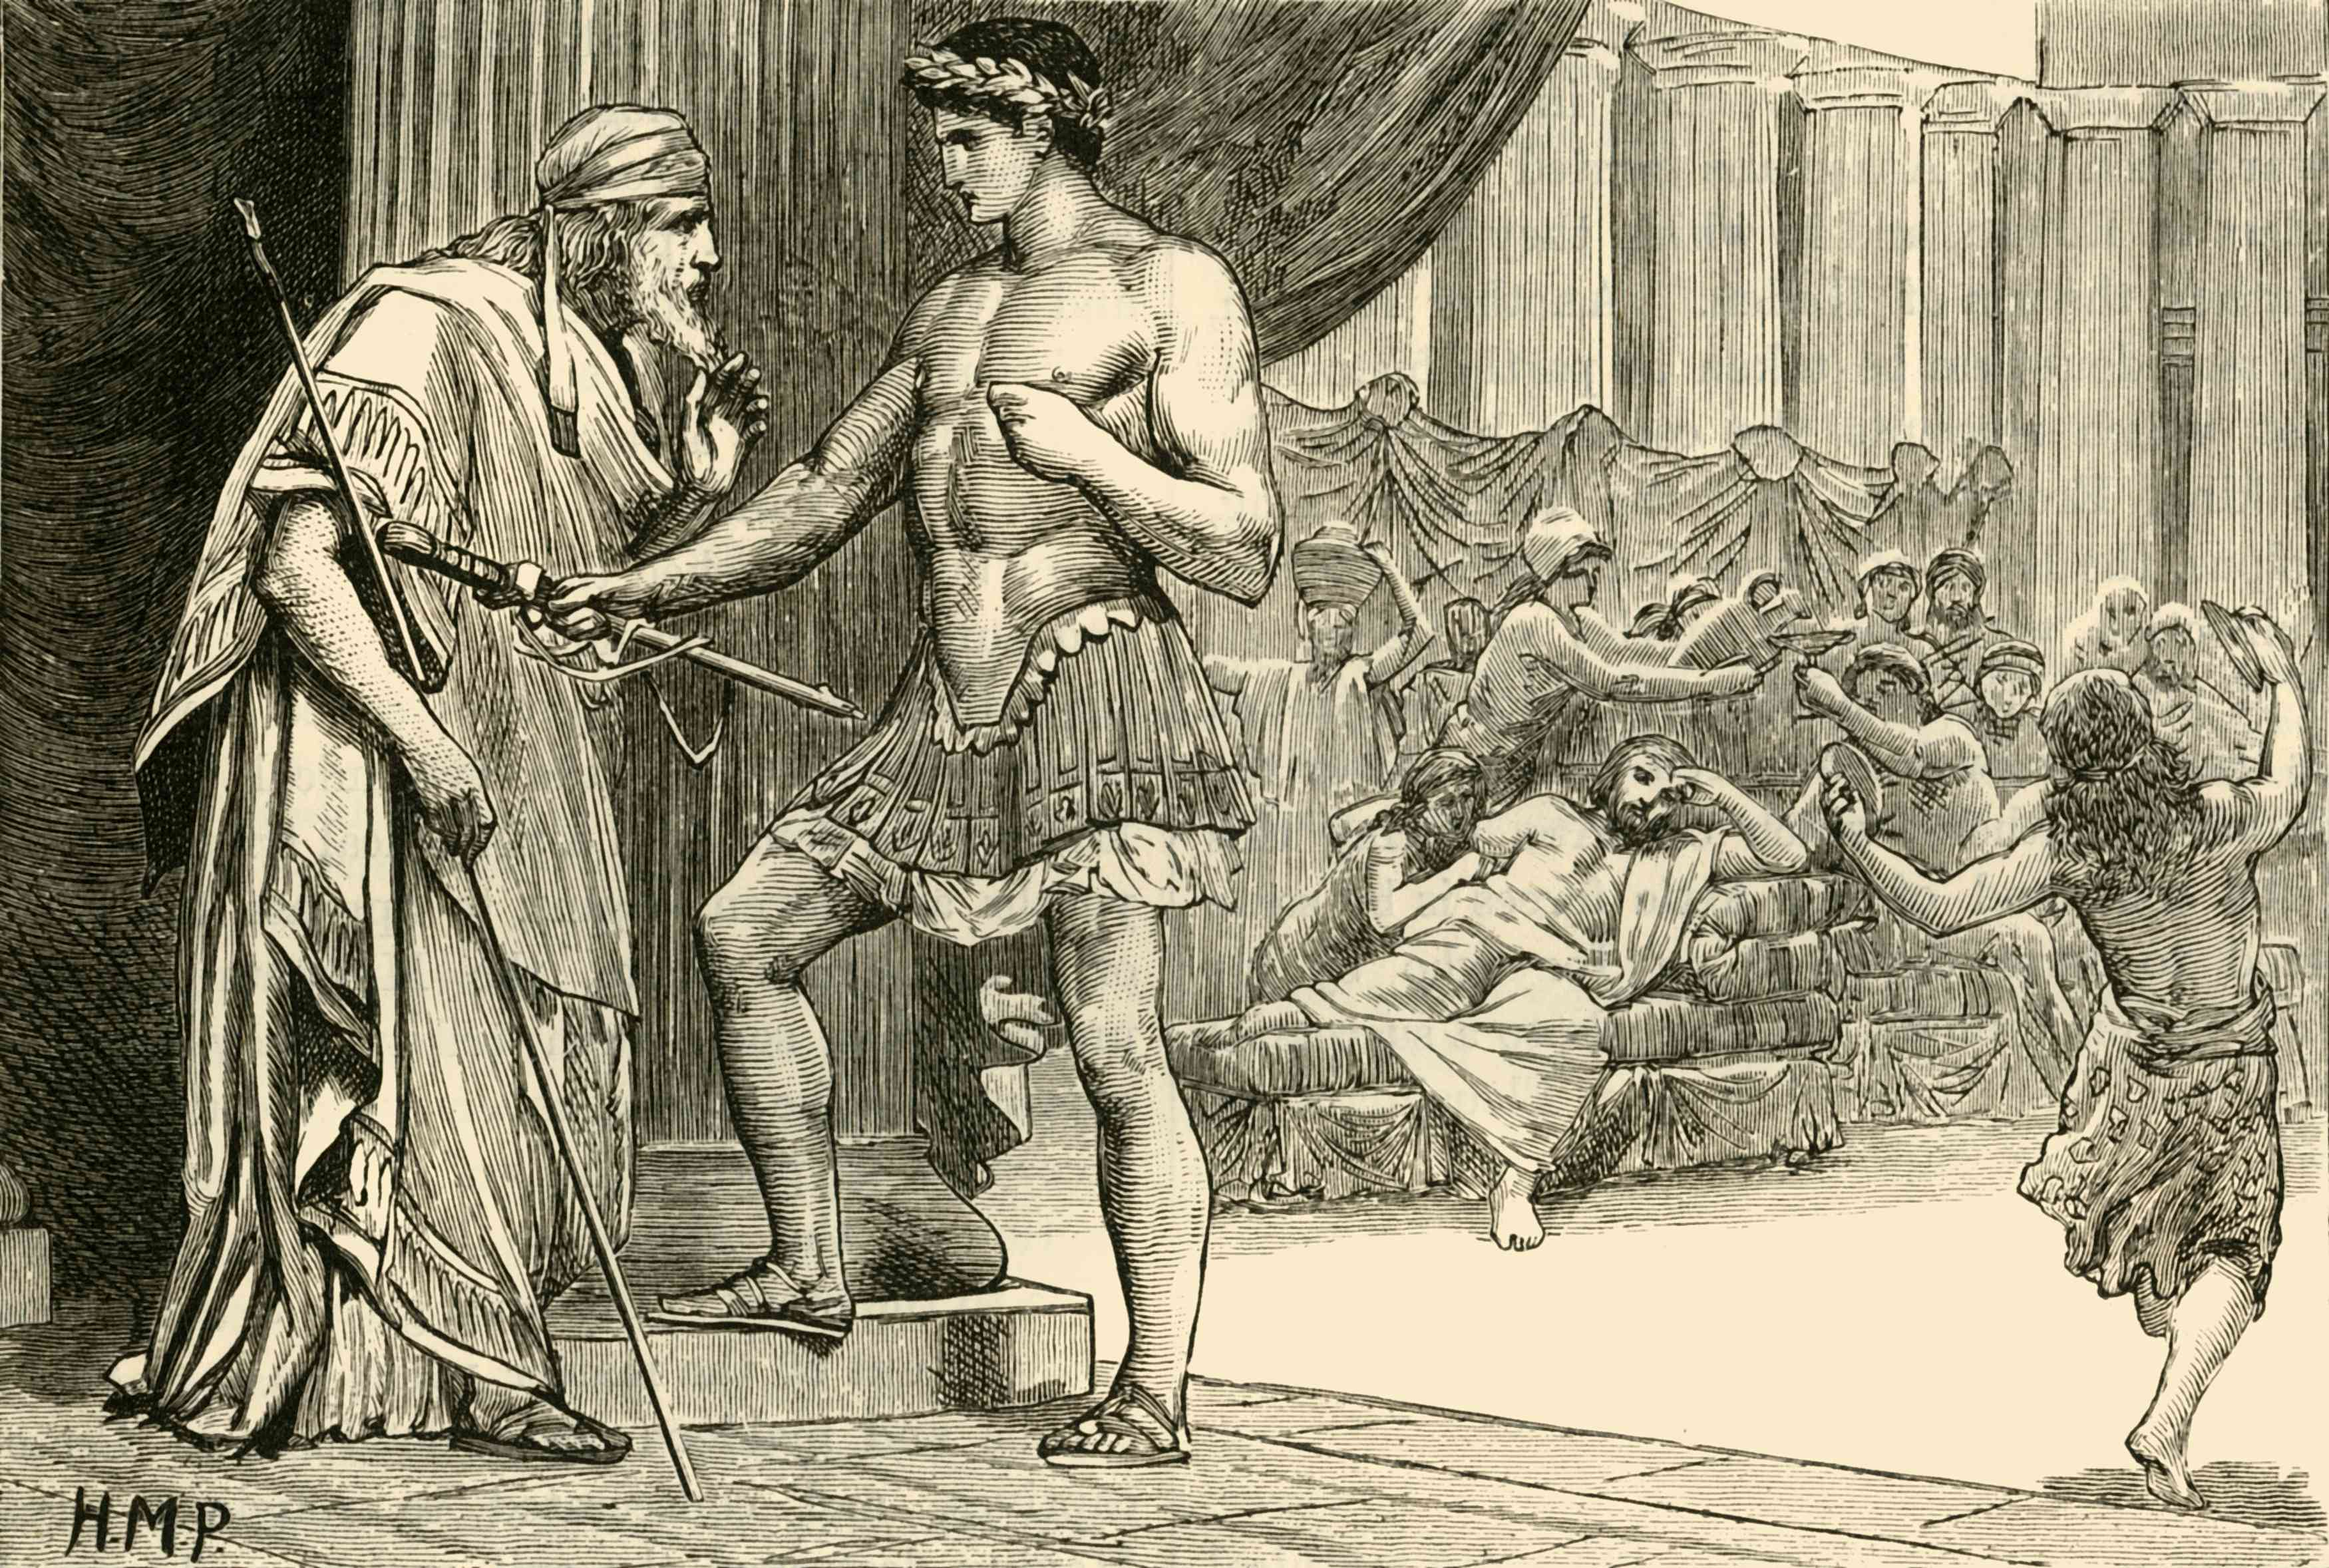 Theseus Identifies Himself to Aegeus, 19th century